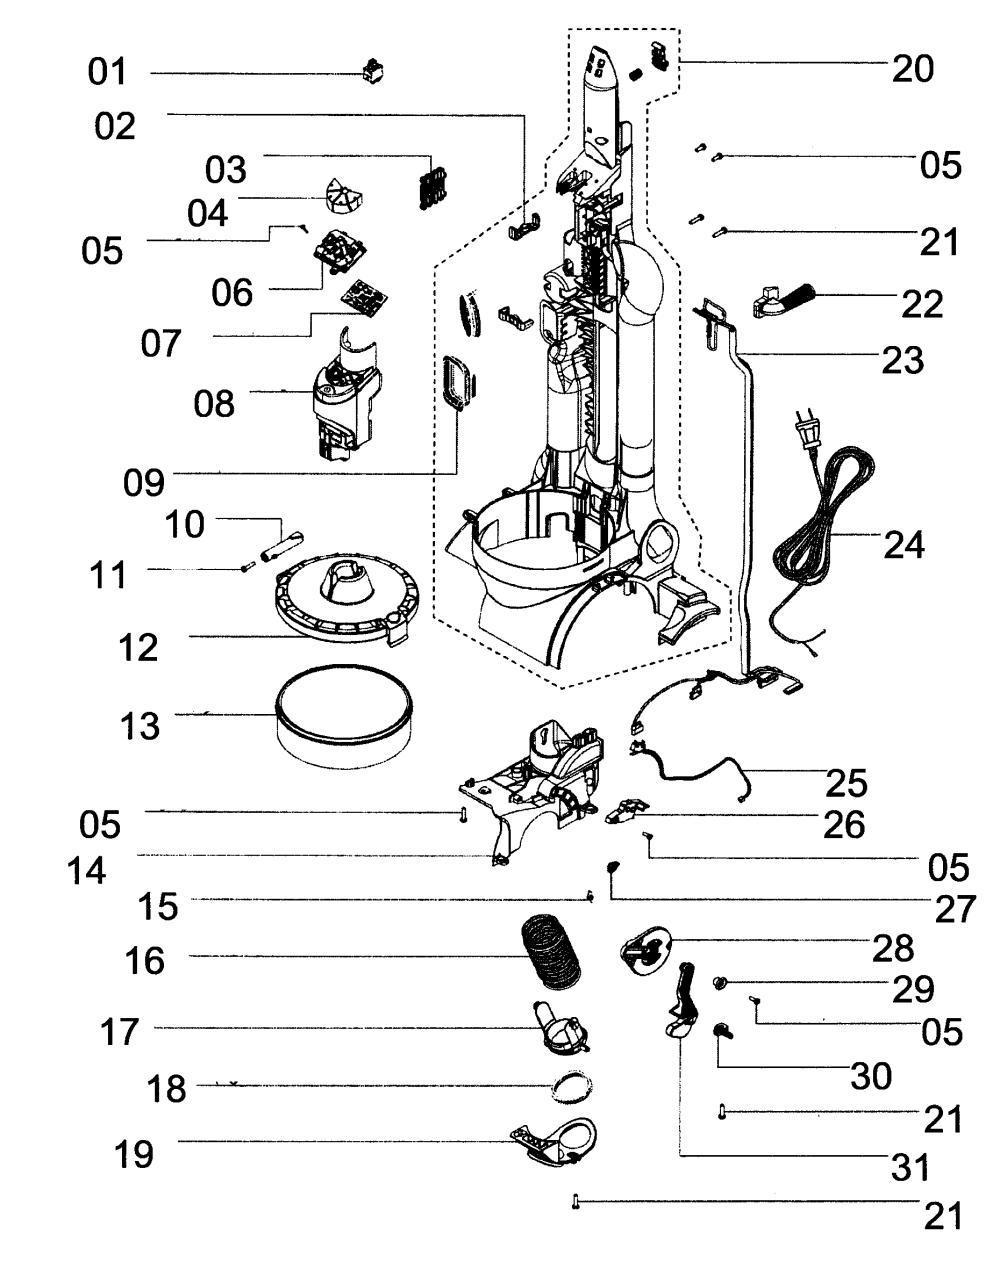 Dyson Wiring Diagram - shark navigator wiring diagram dyson ... on